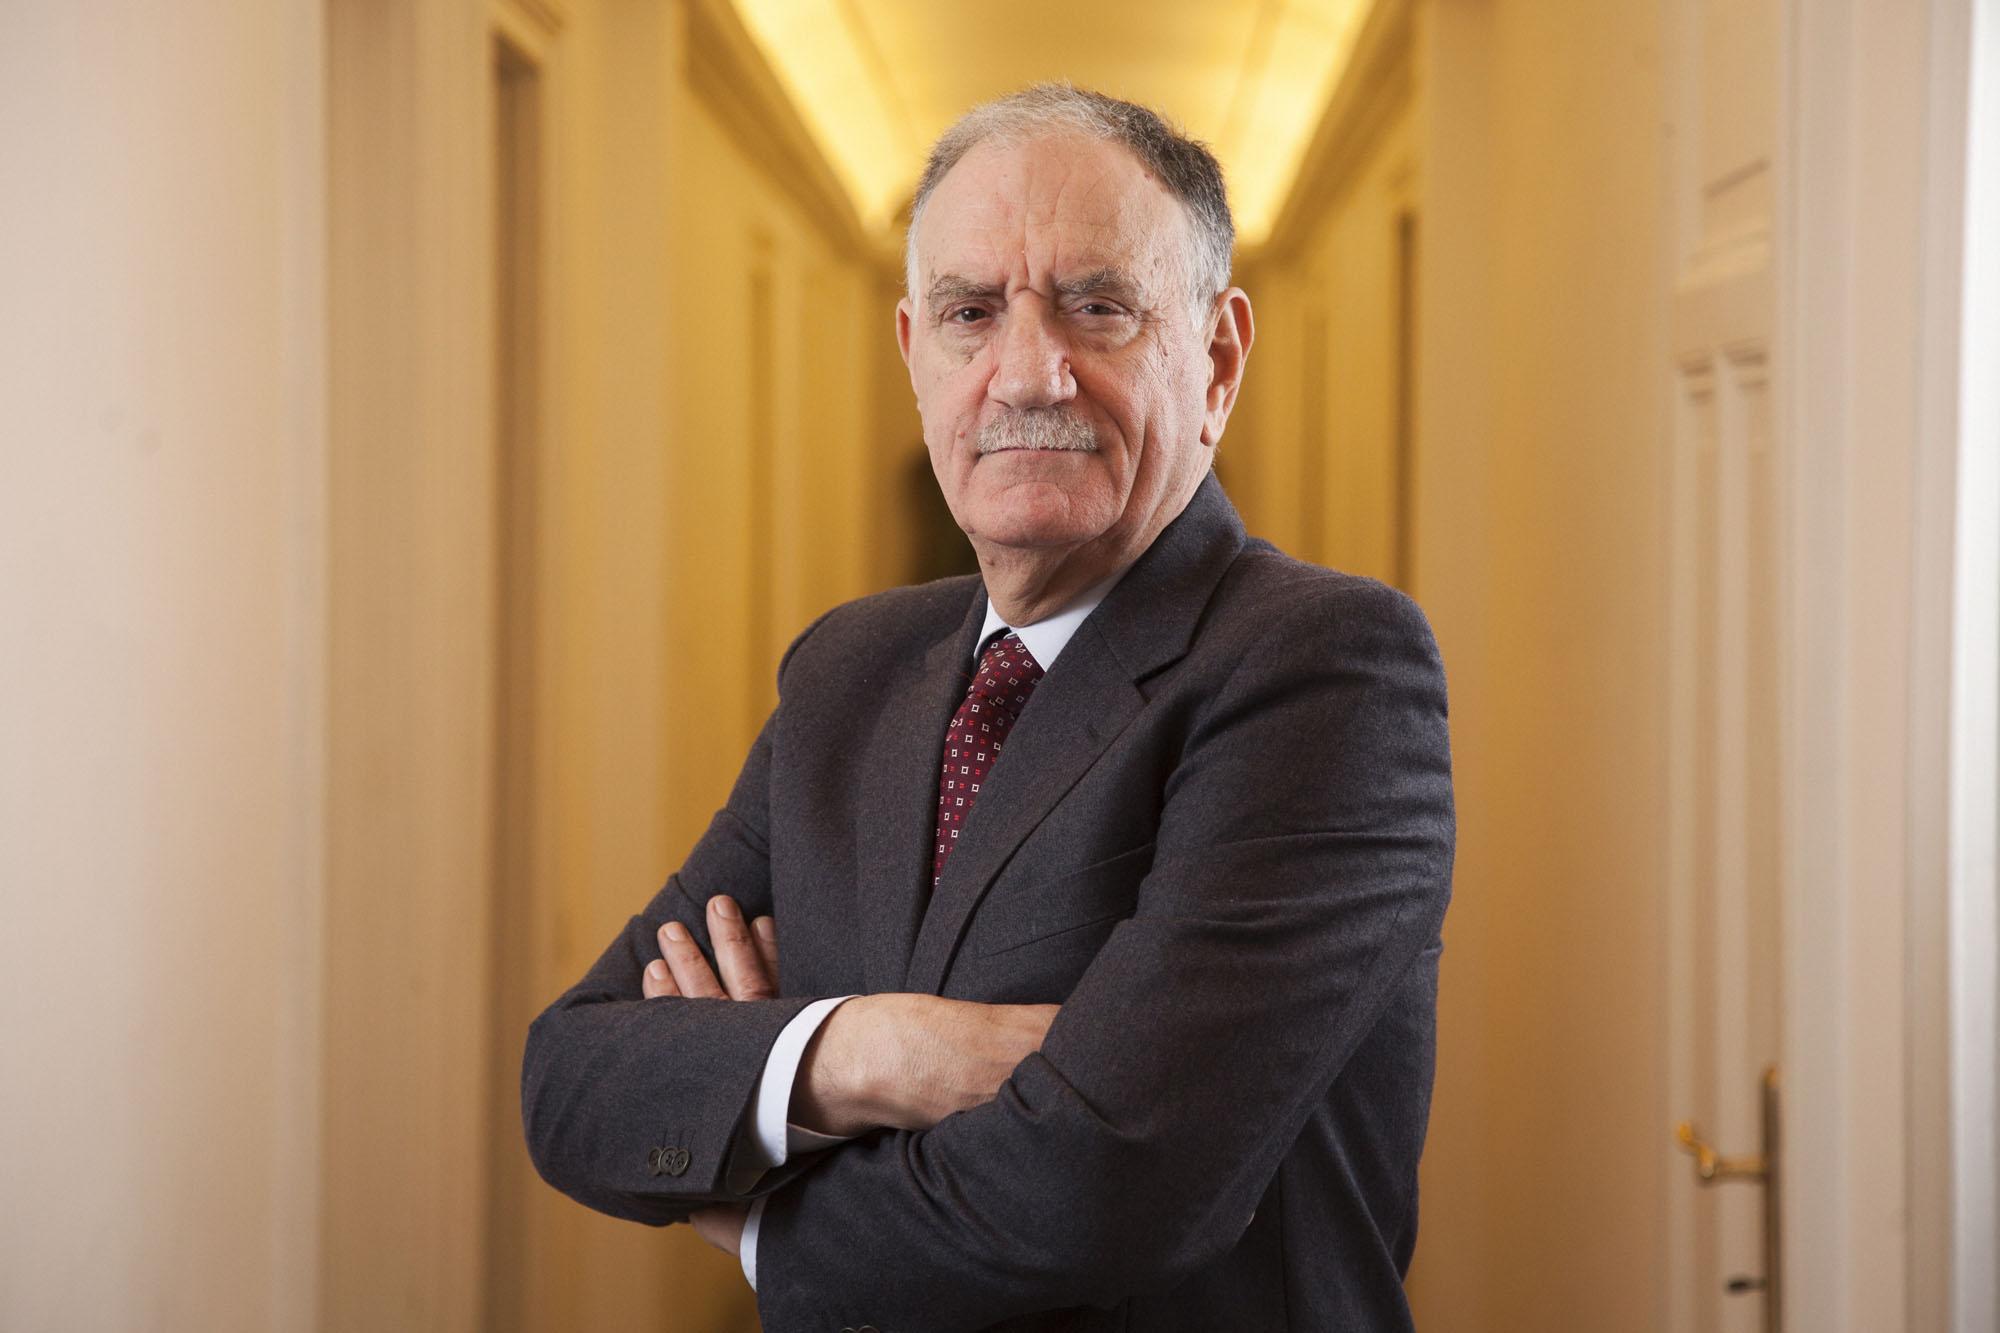 Avvocato Riccardo Chilosi